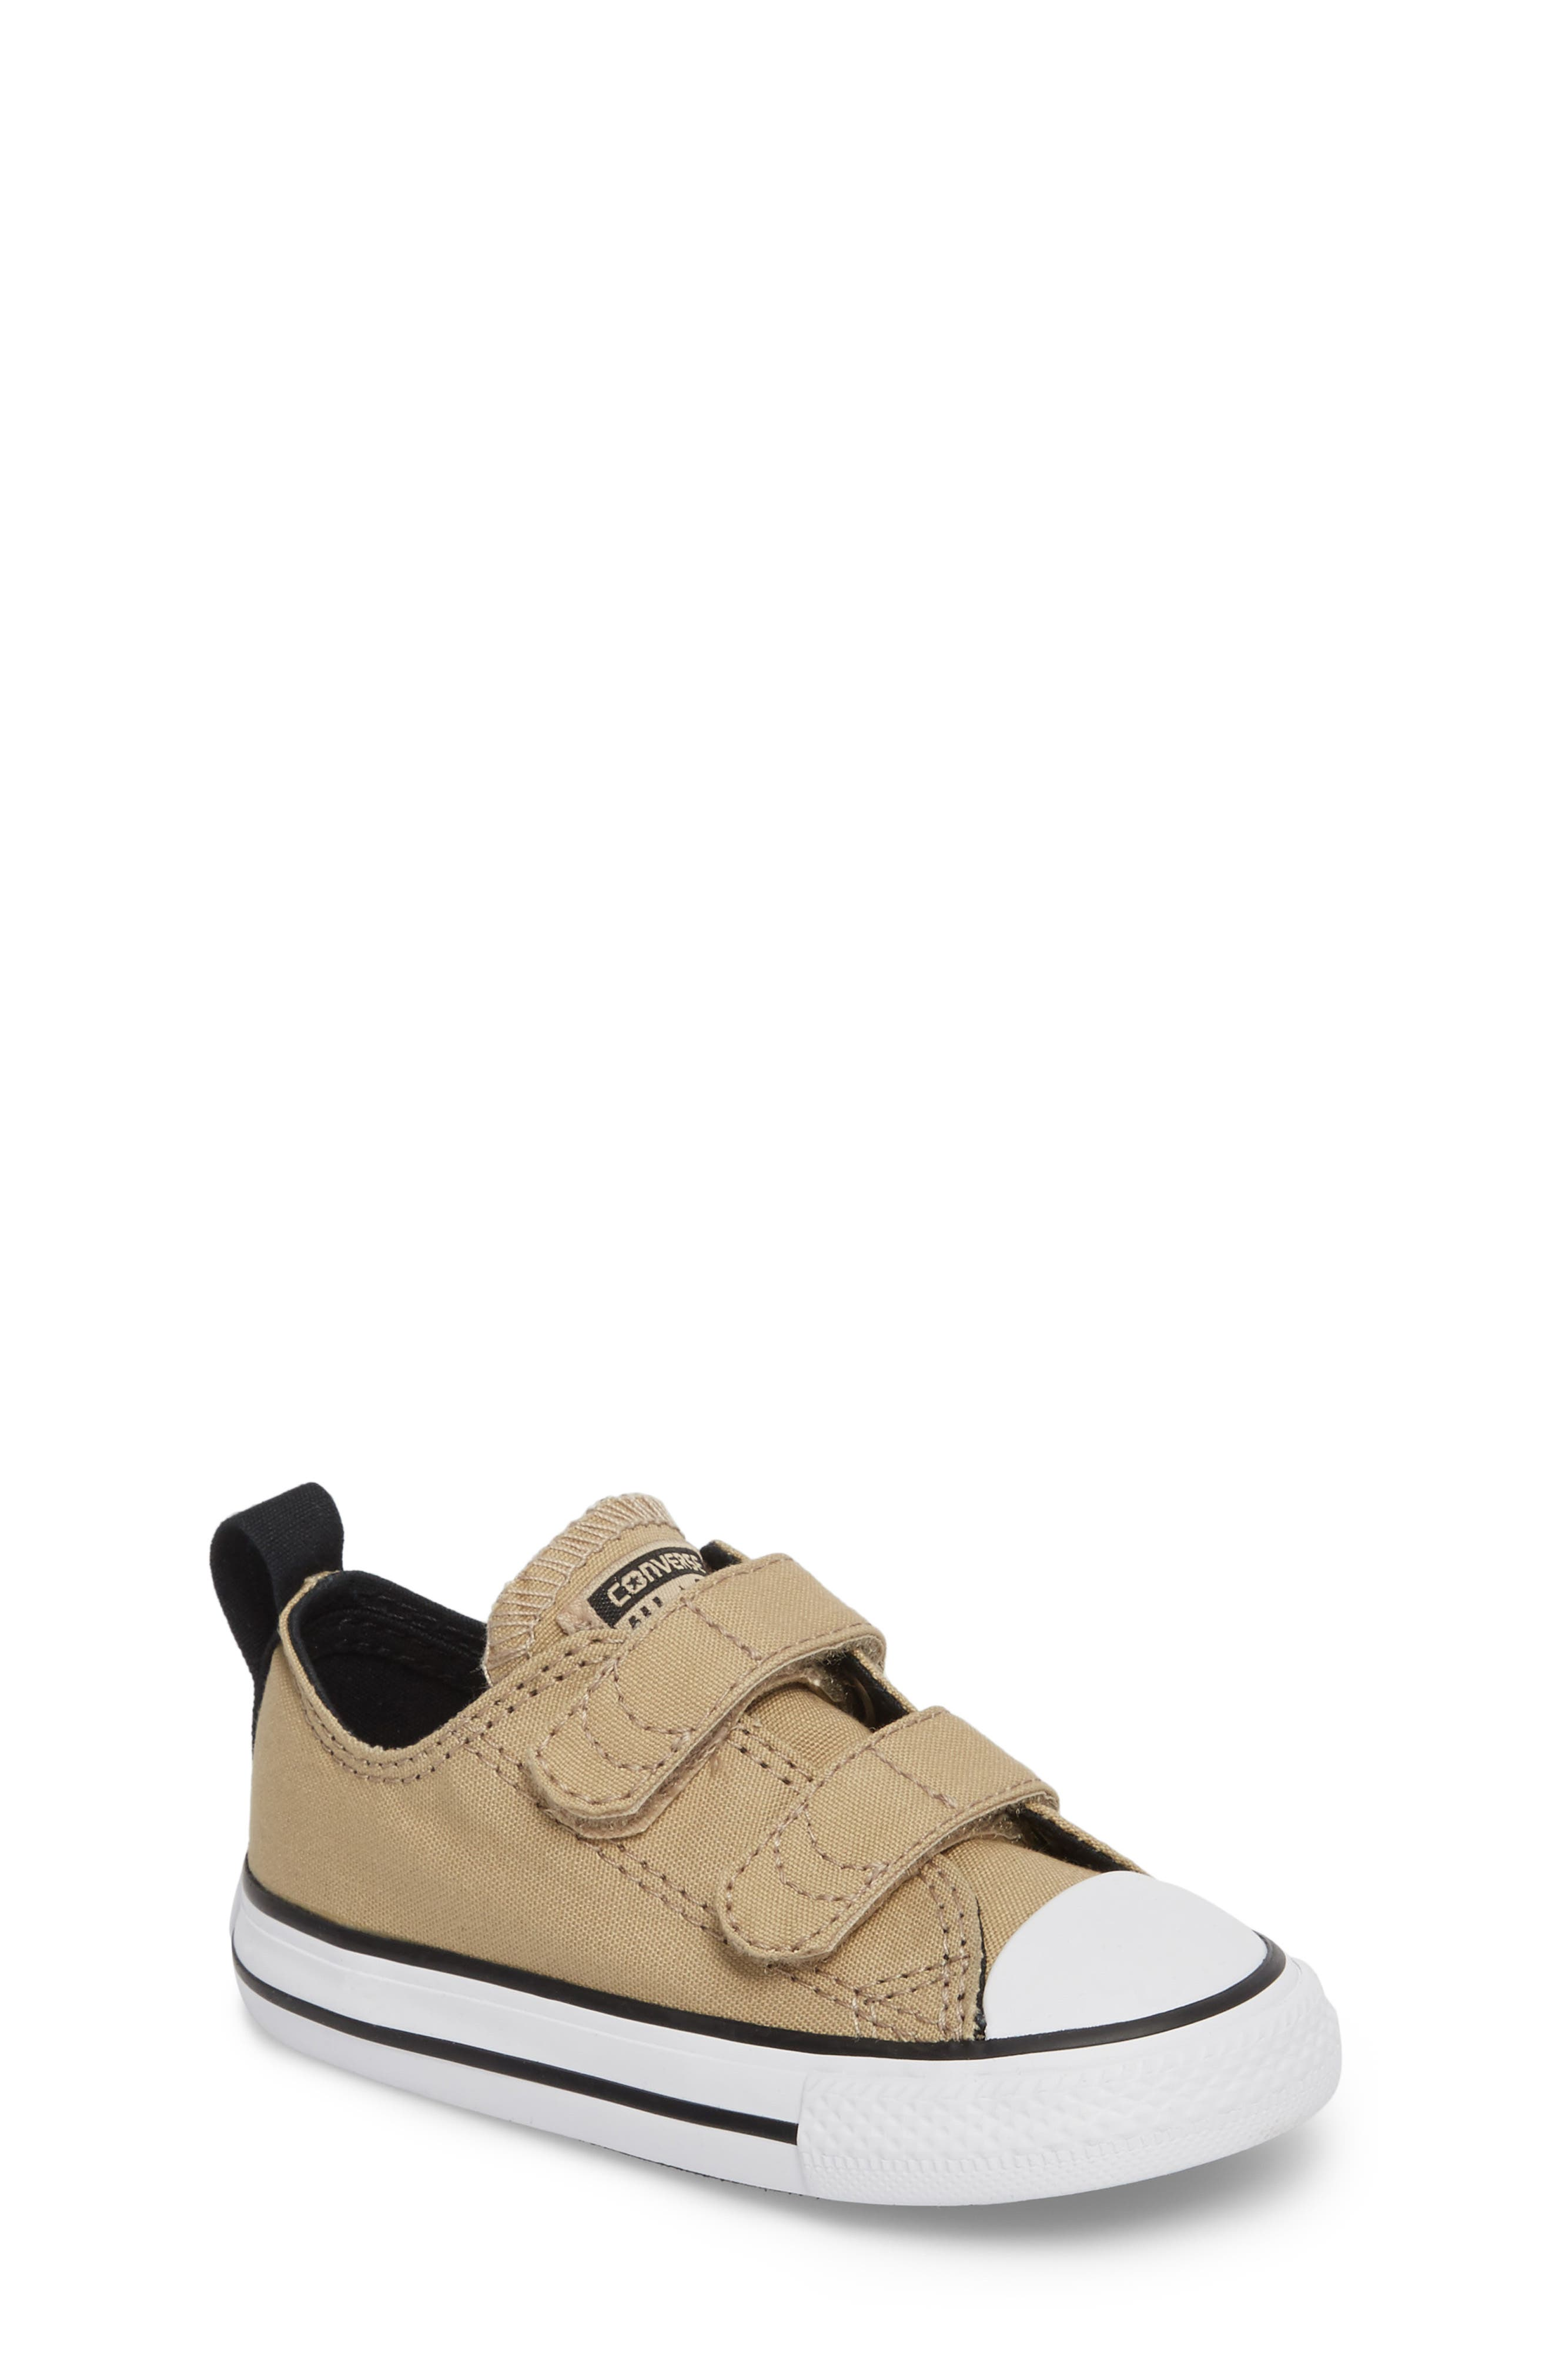 All Star<sup>®</sup> 2V Low Top Sneaker,                             Main thumbnail 1, color,                             Vintage Khaki